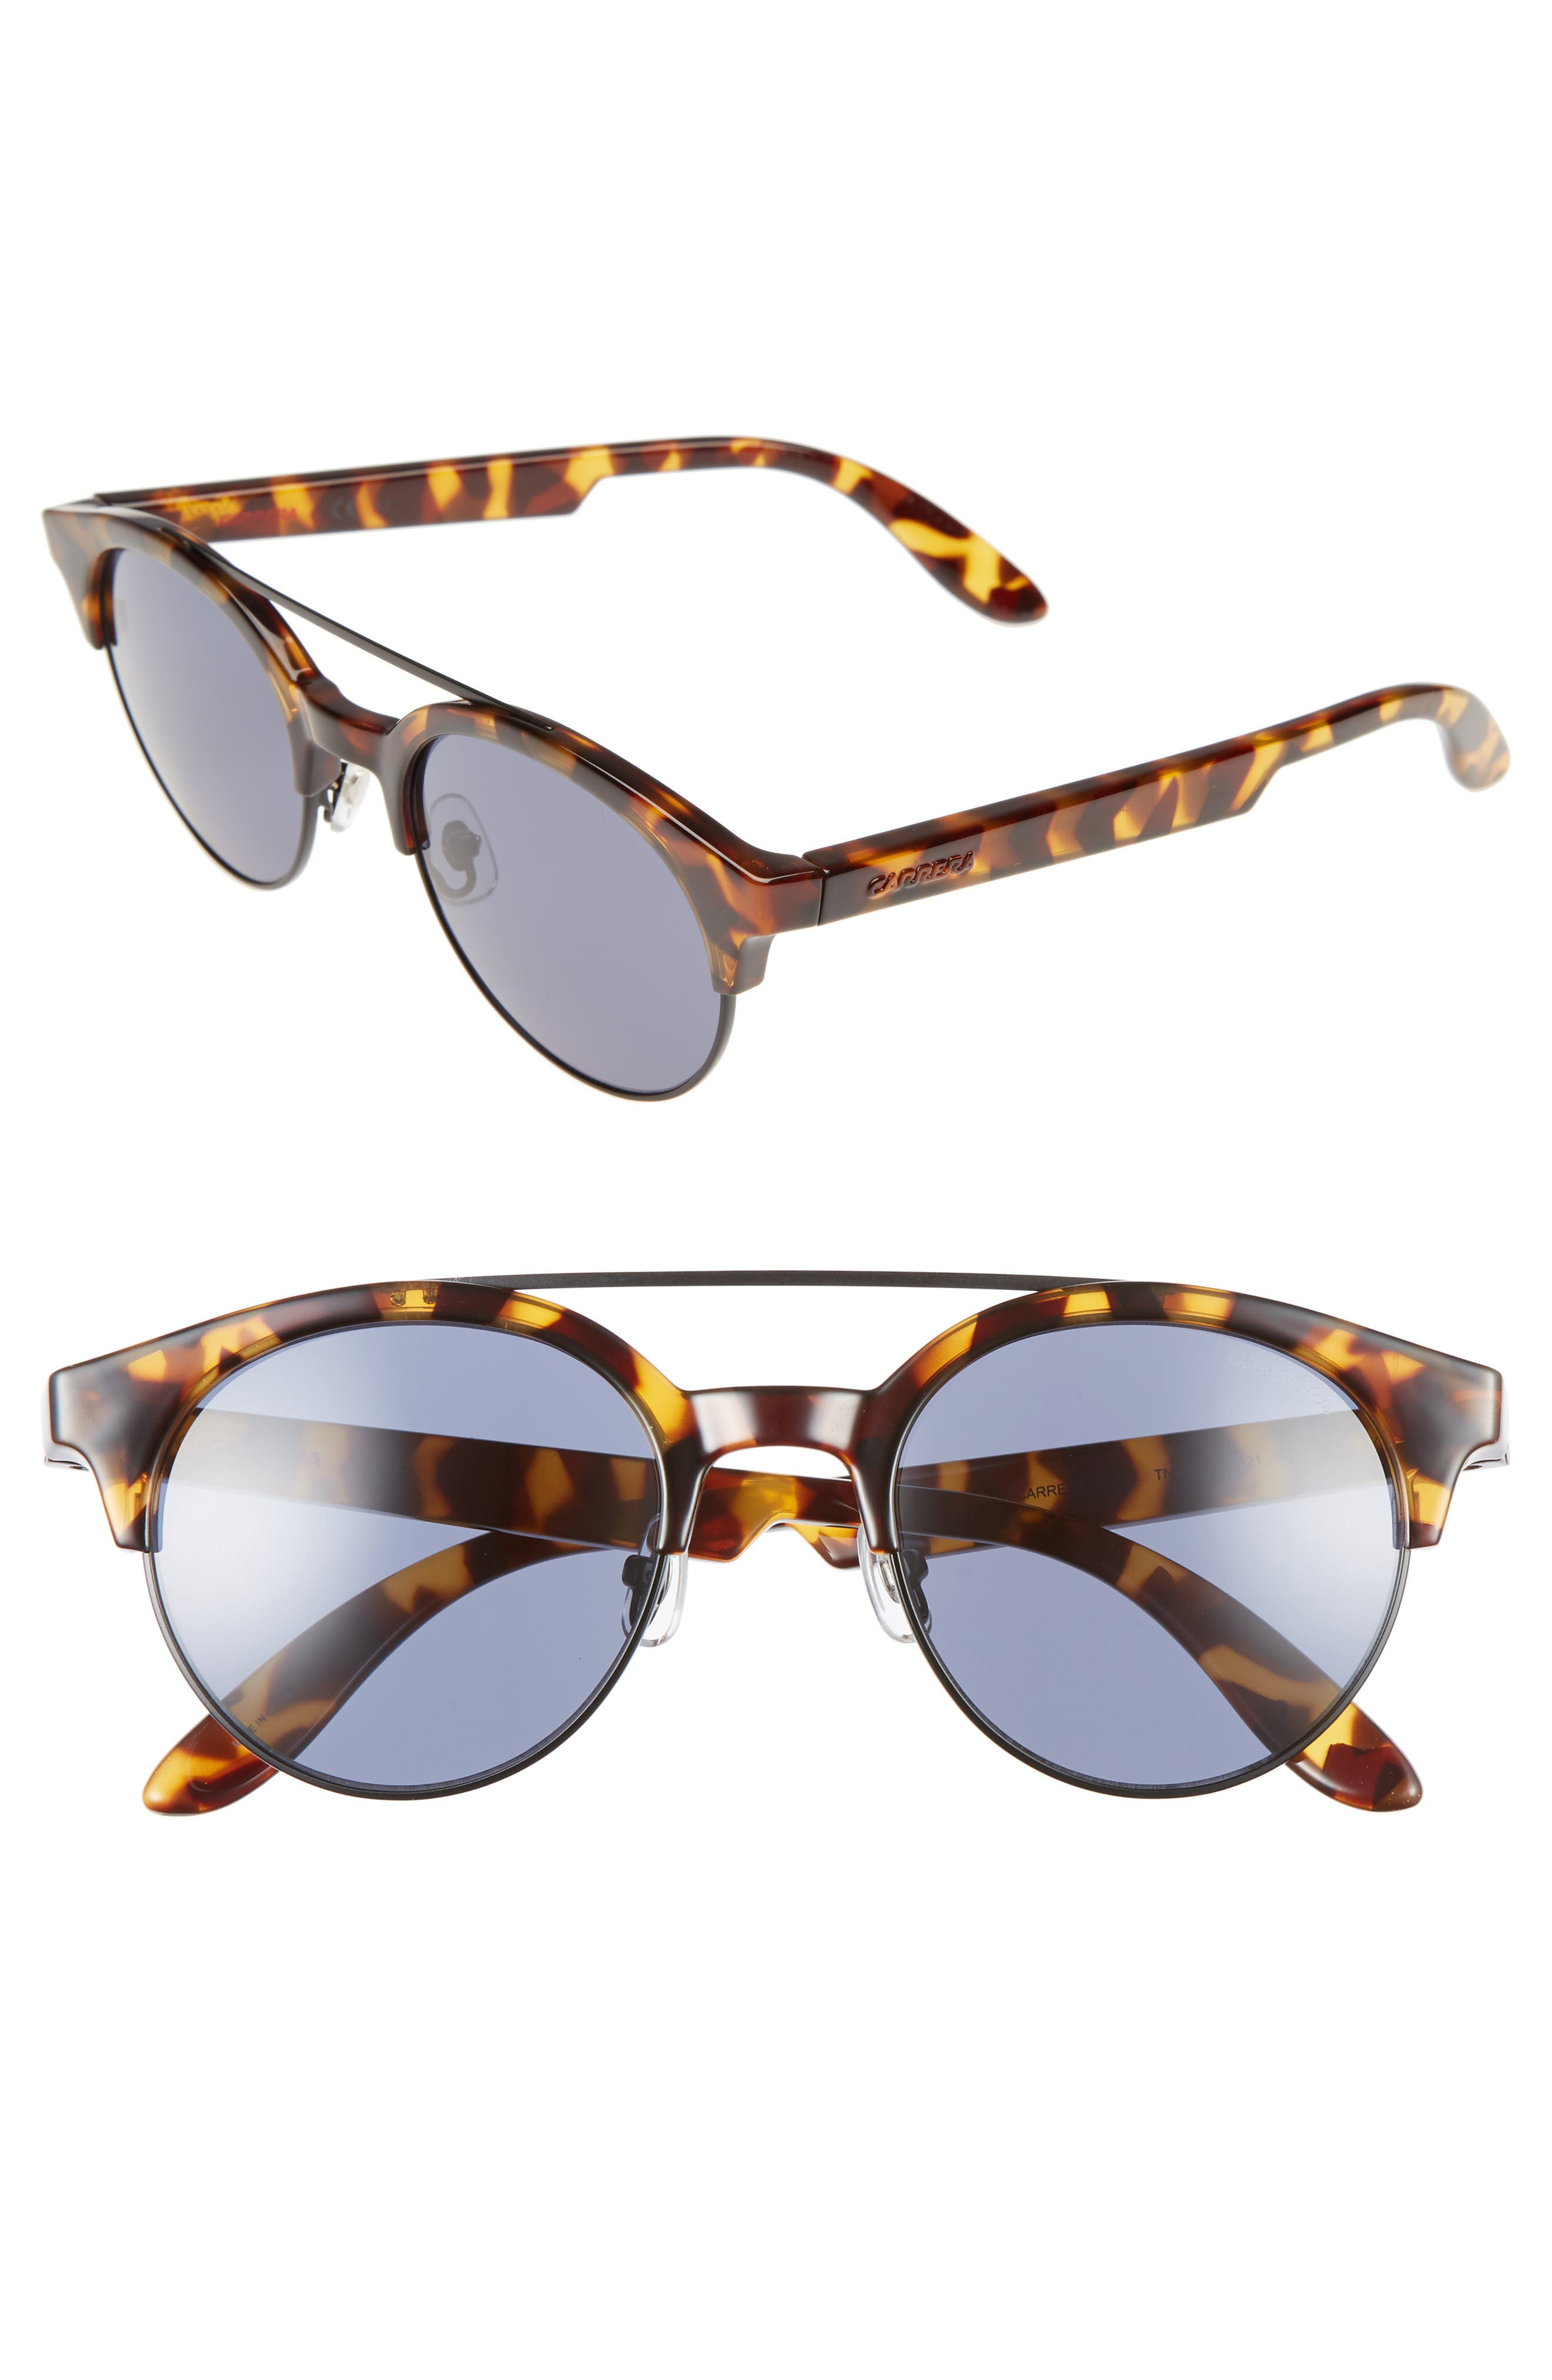 Retro 50mm Sunglasses,                             Main thumbnail 1, color,                             Havana Black